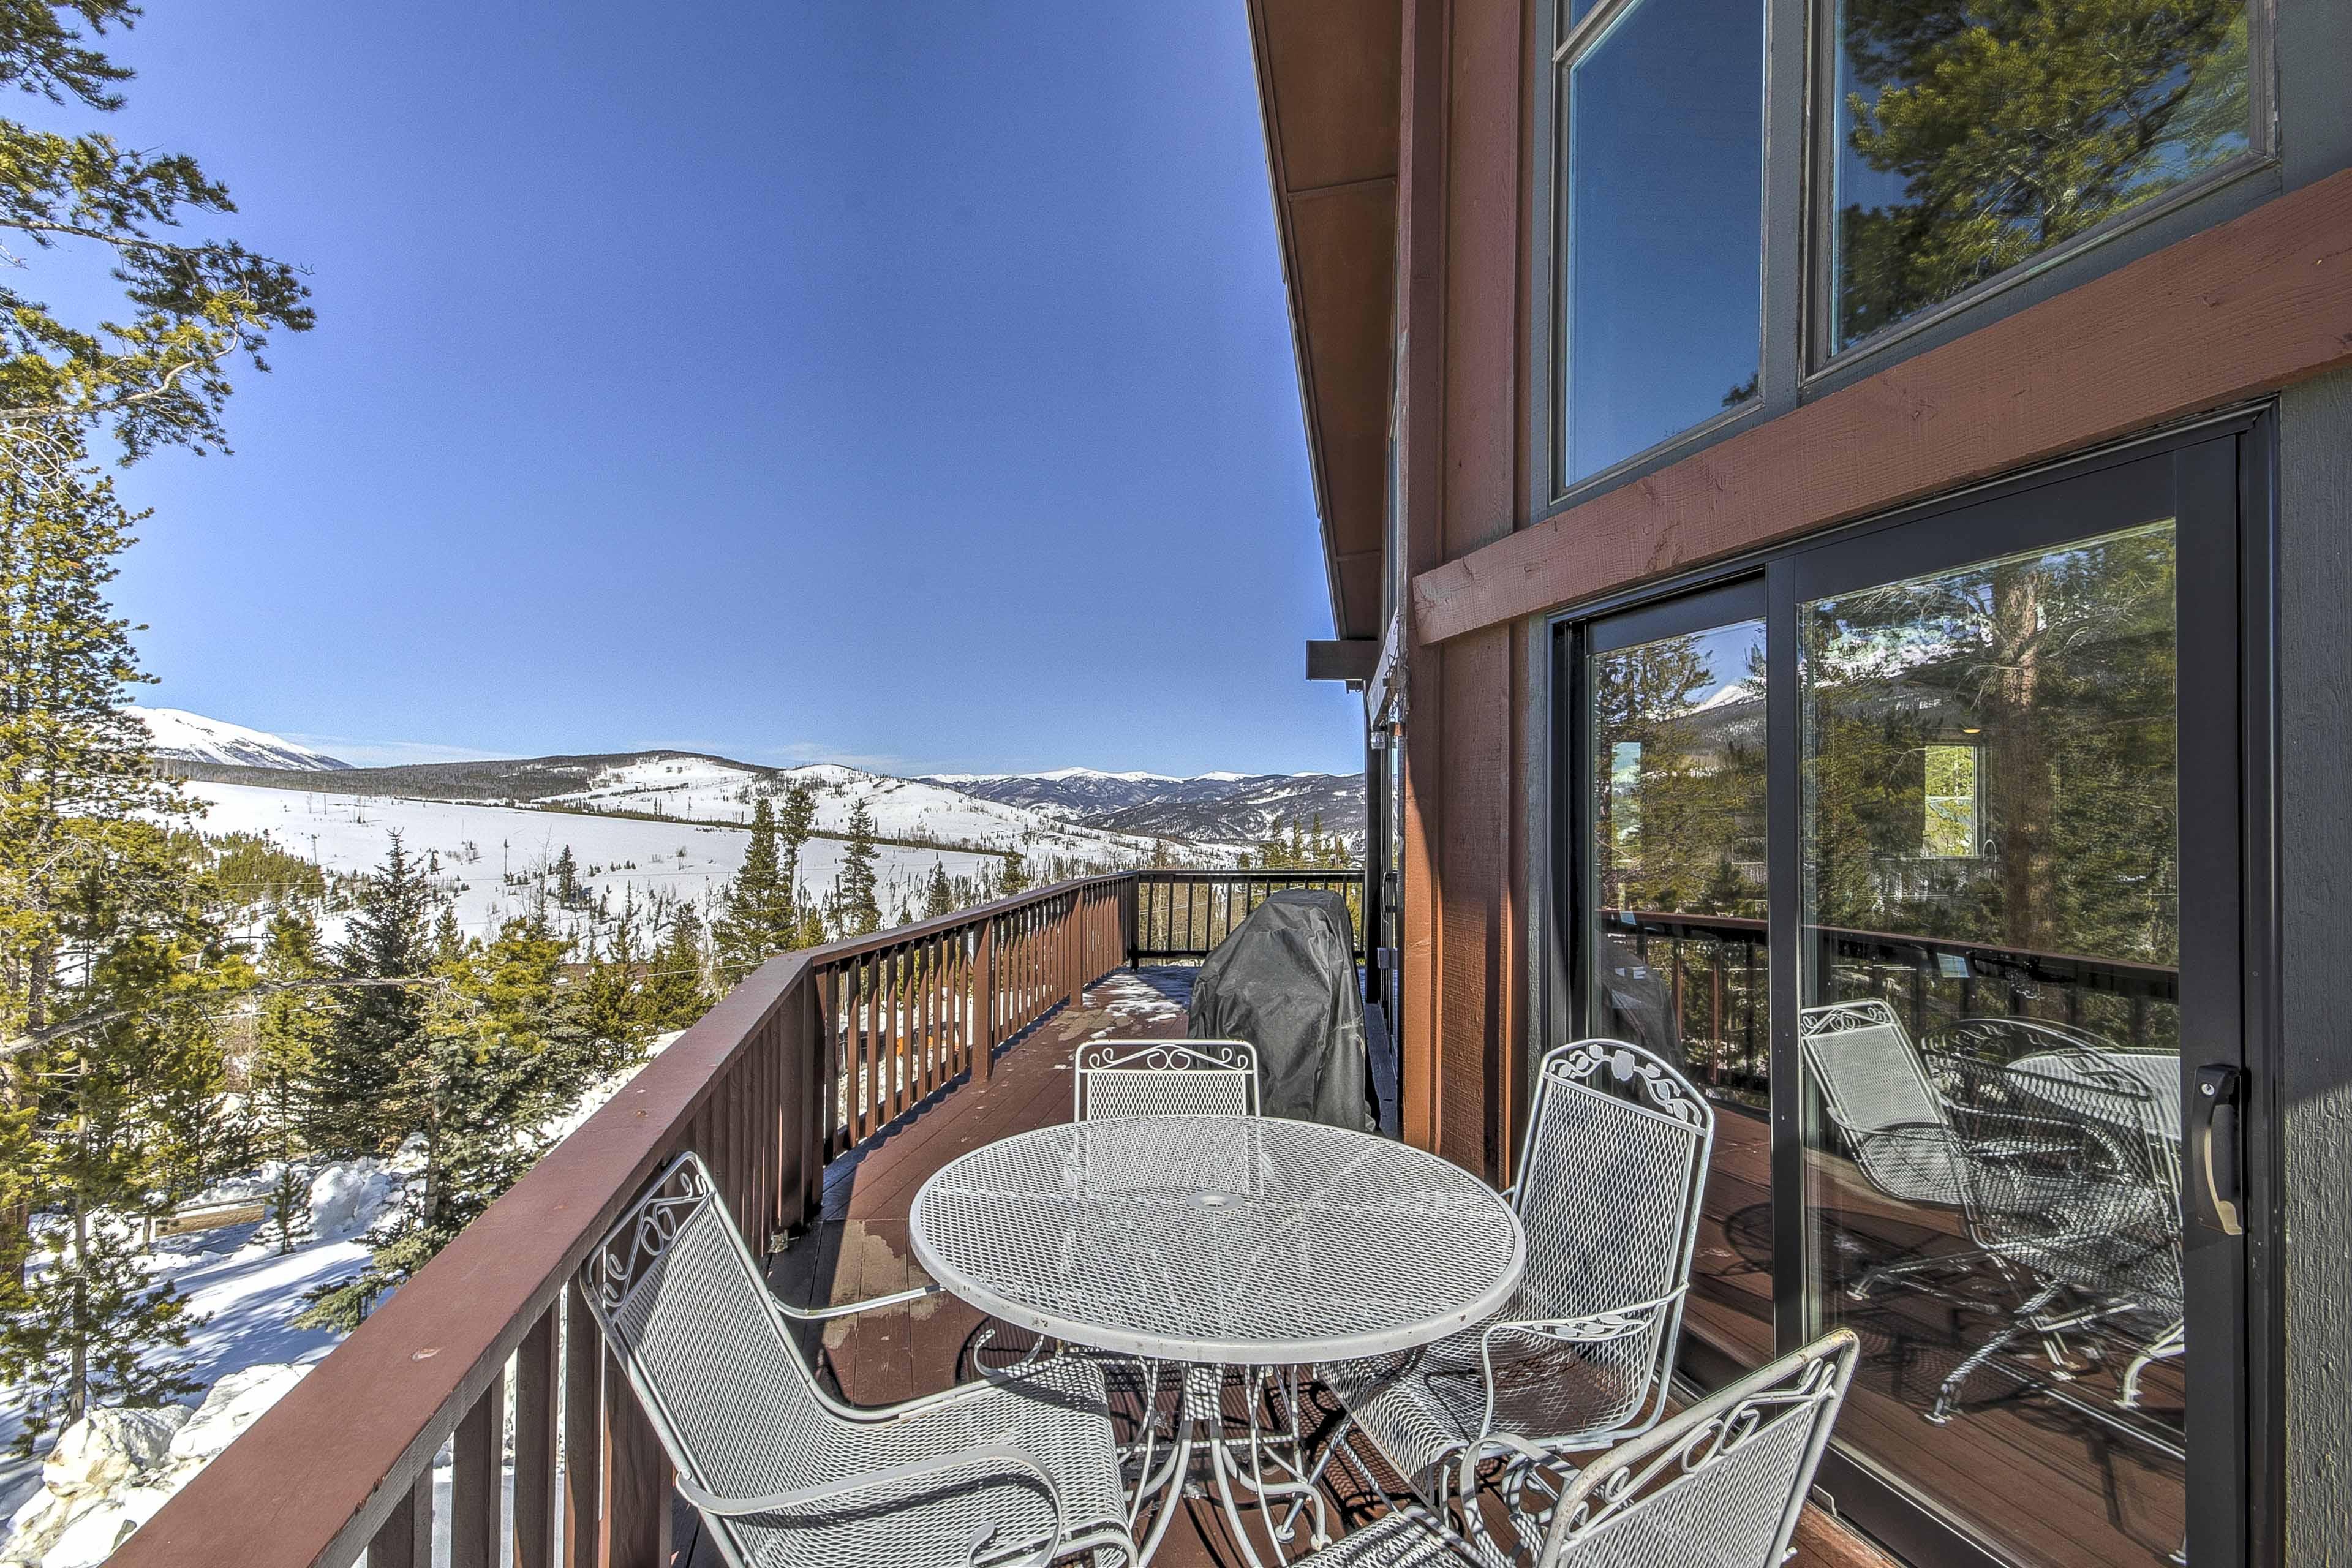 Stunning mountain views await at this gorgeous Breckenridge chalet.